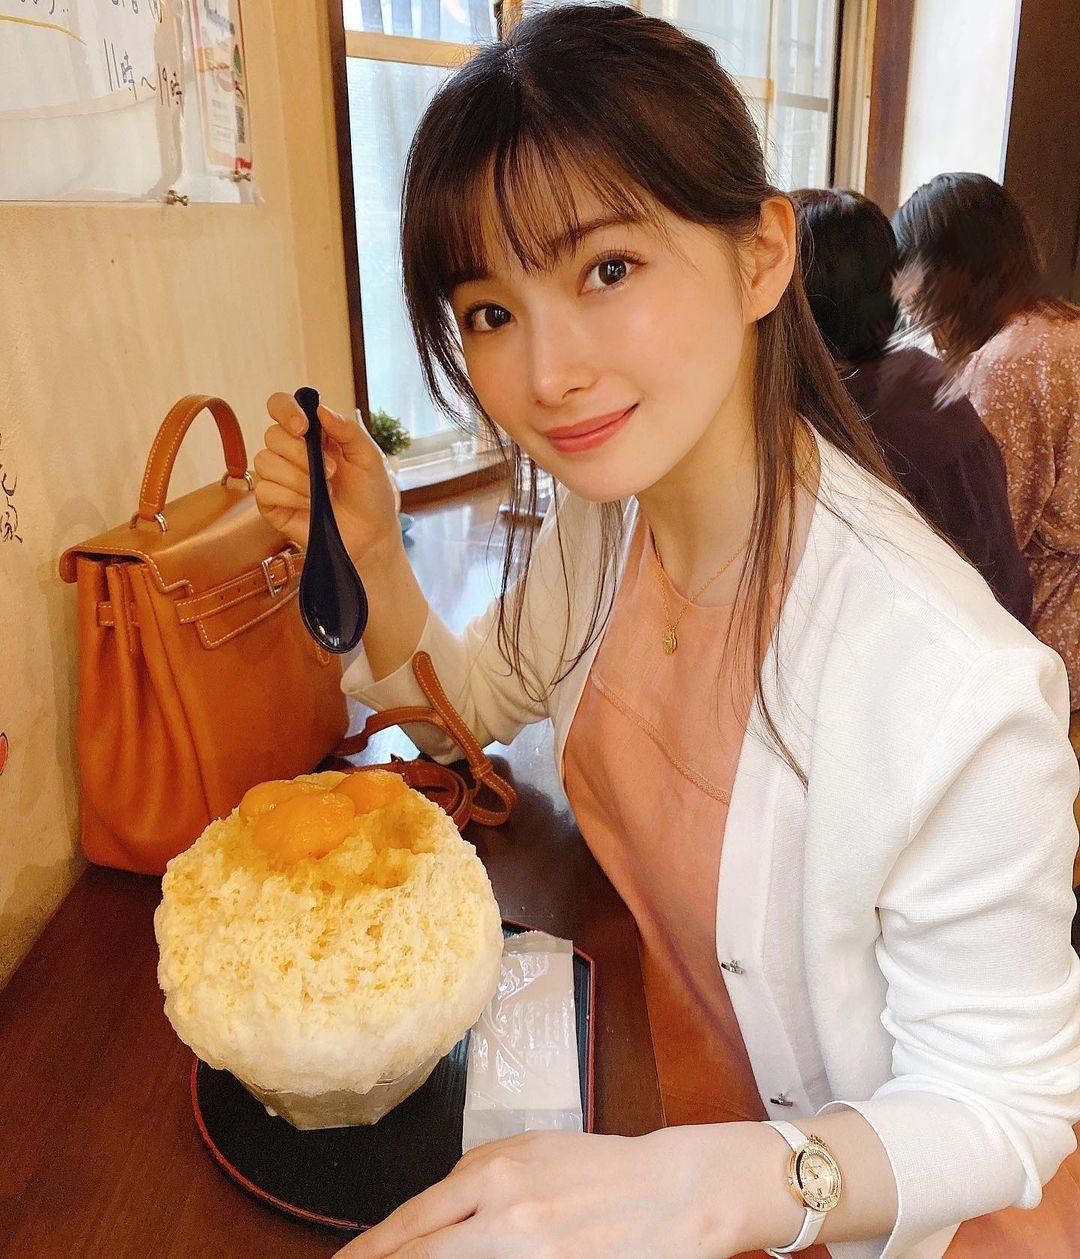 人气实境节目《双层公寓》成员早田ゆりこ成为气质皮肤科医师-新图包